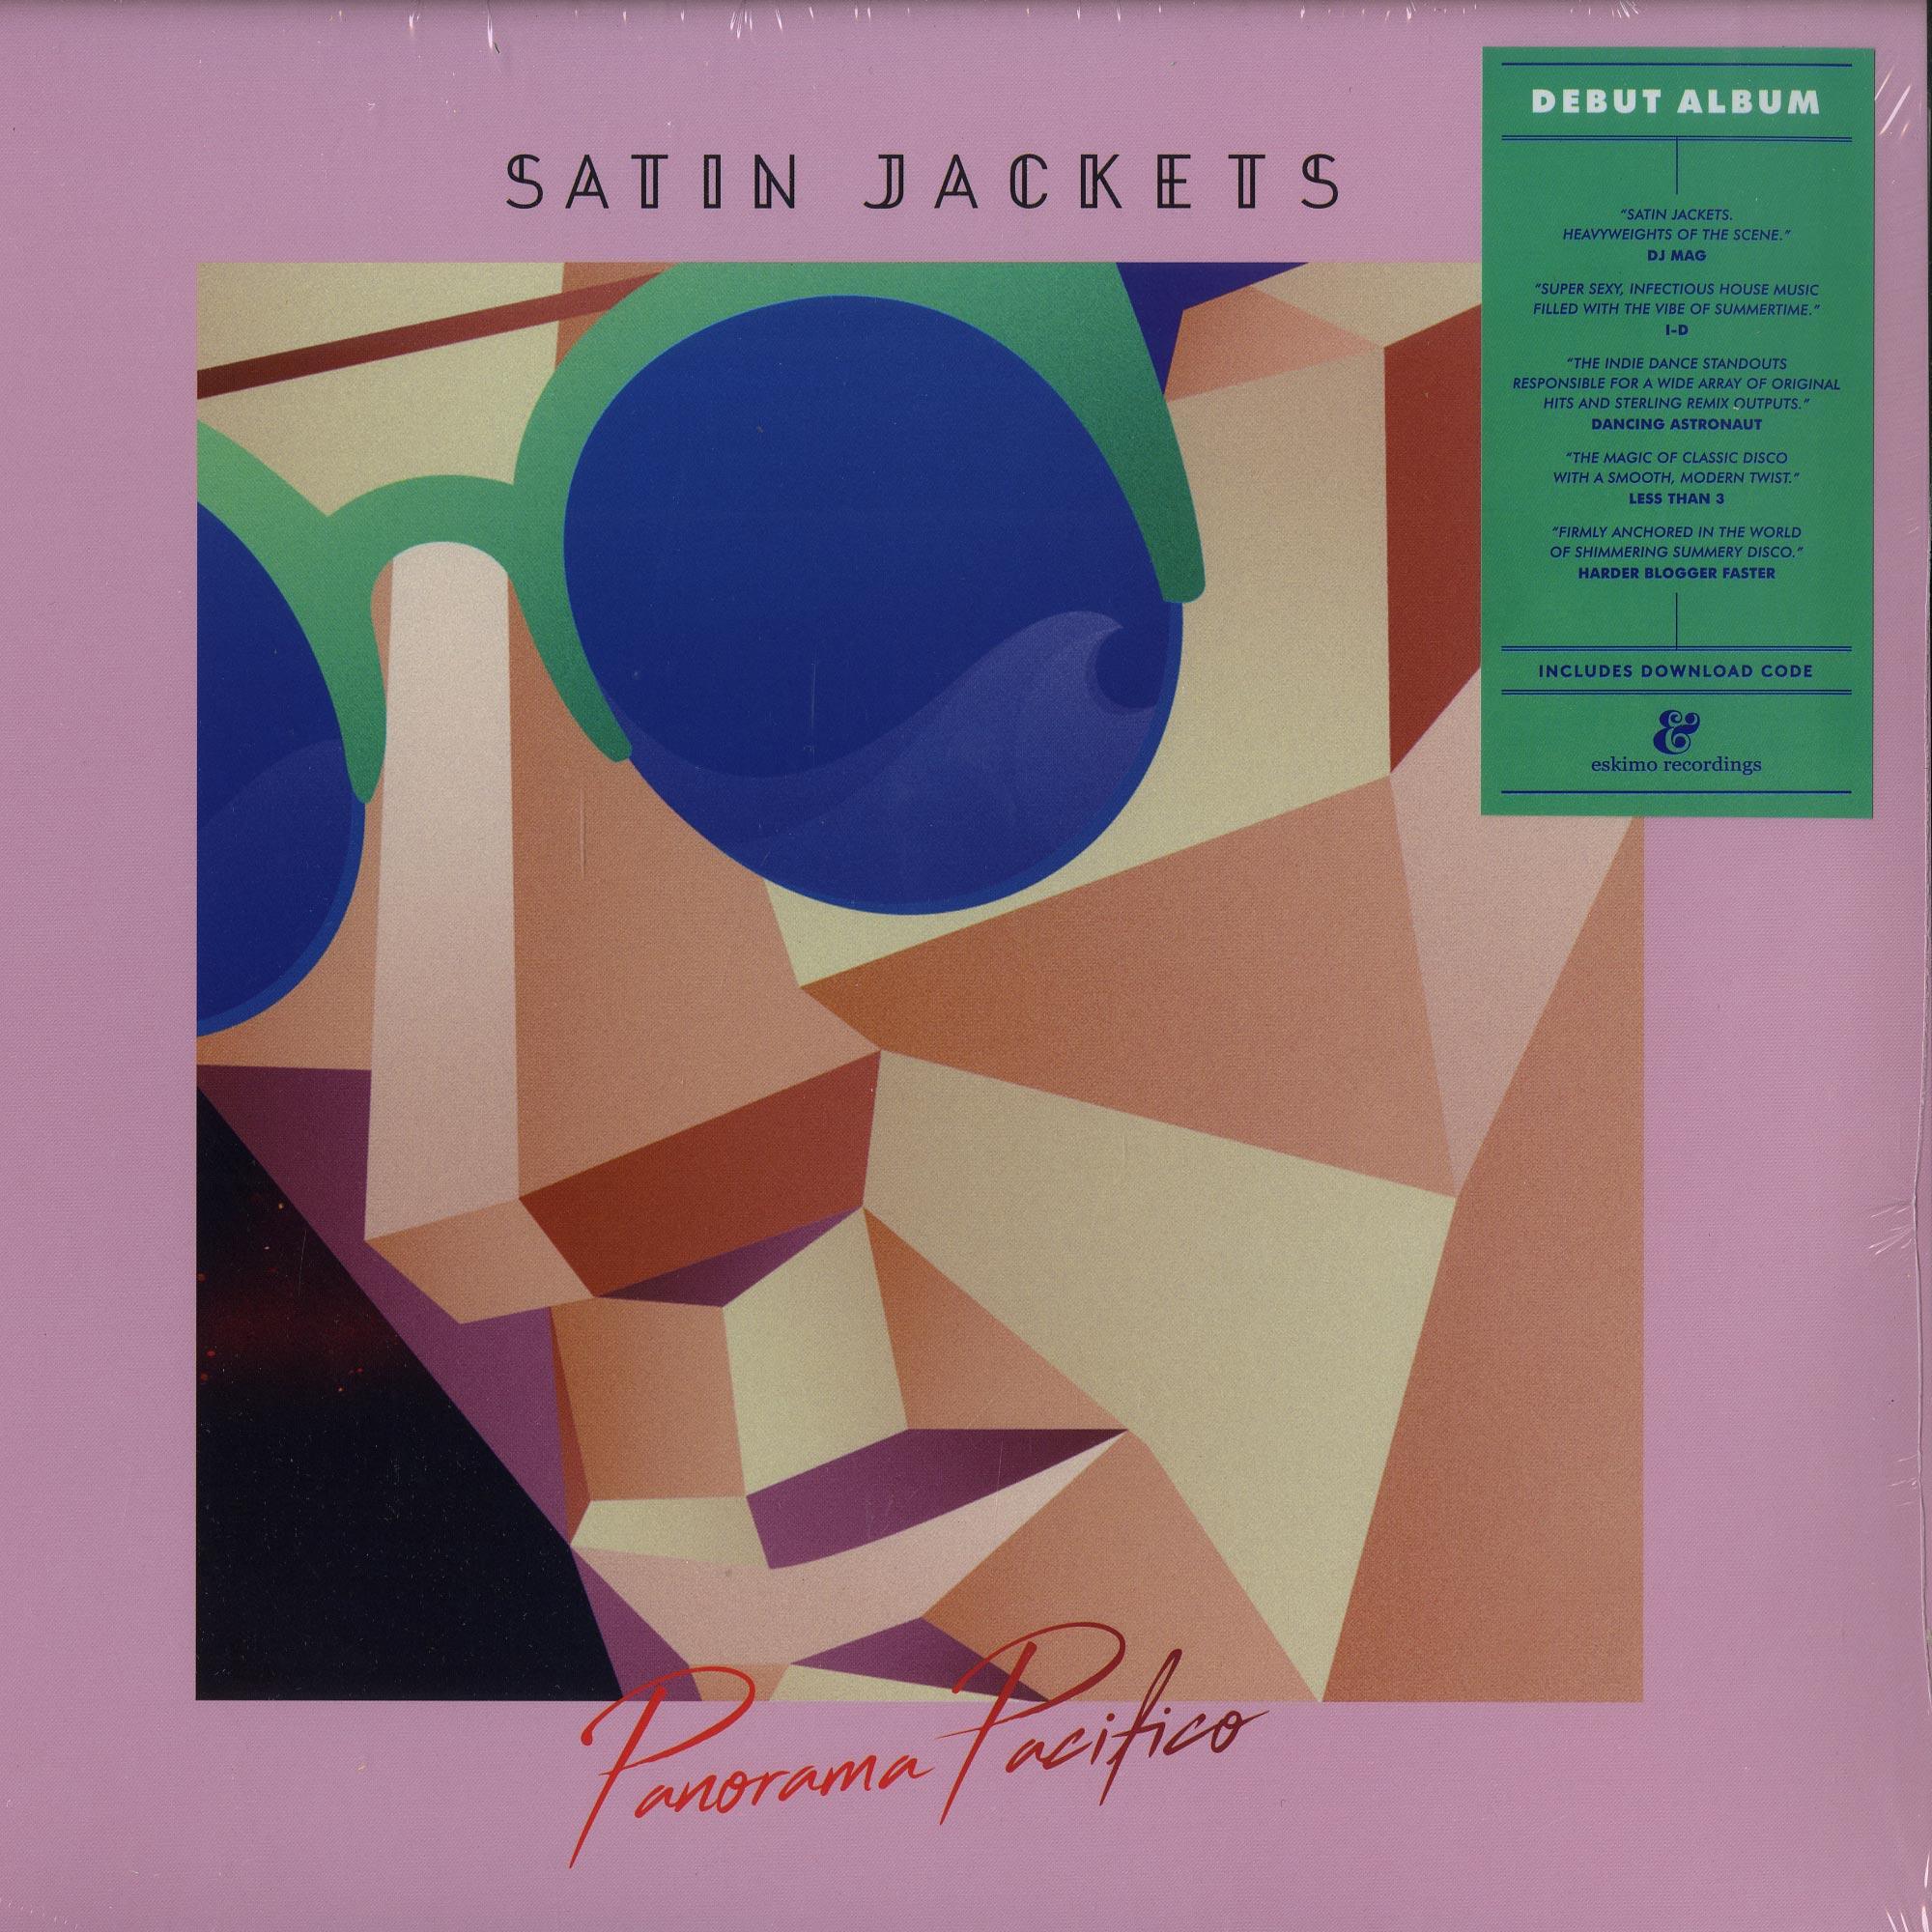 Satin Jackets - PANORAMA PACIFICO